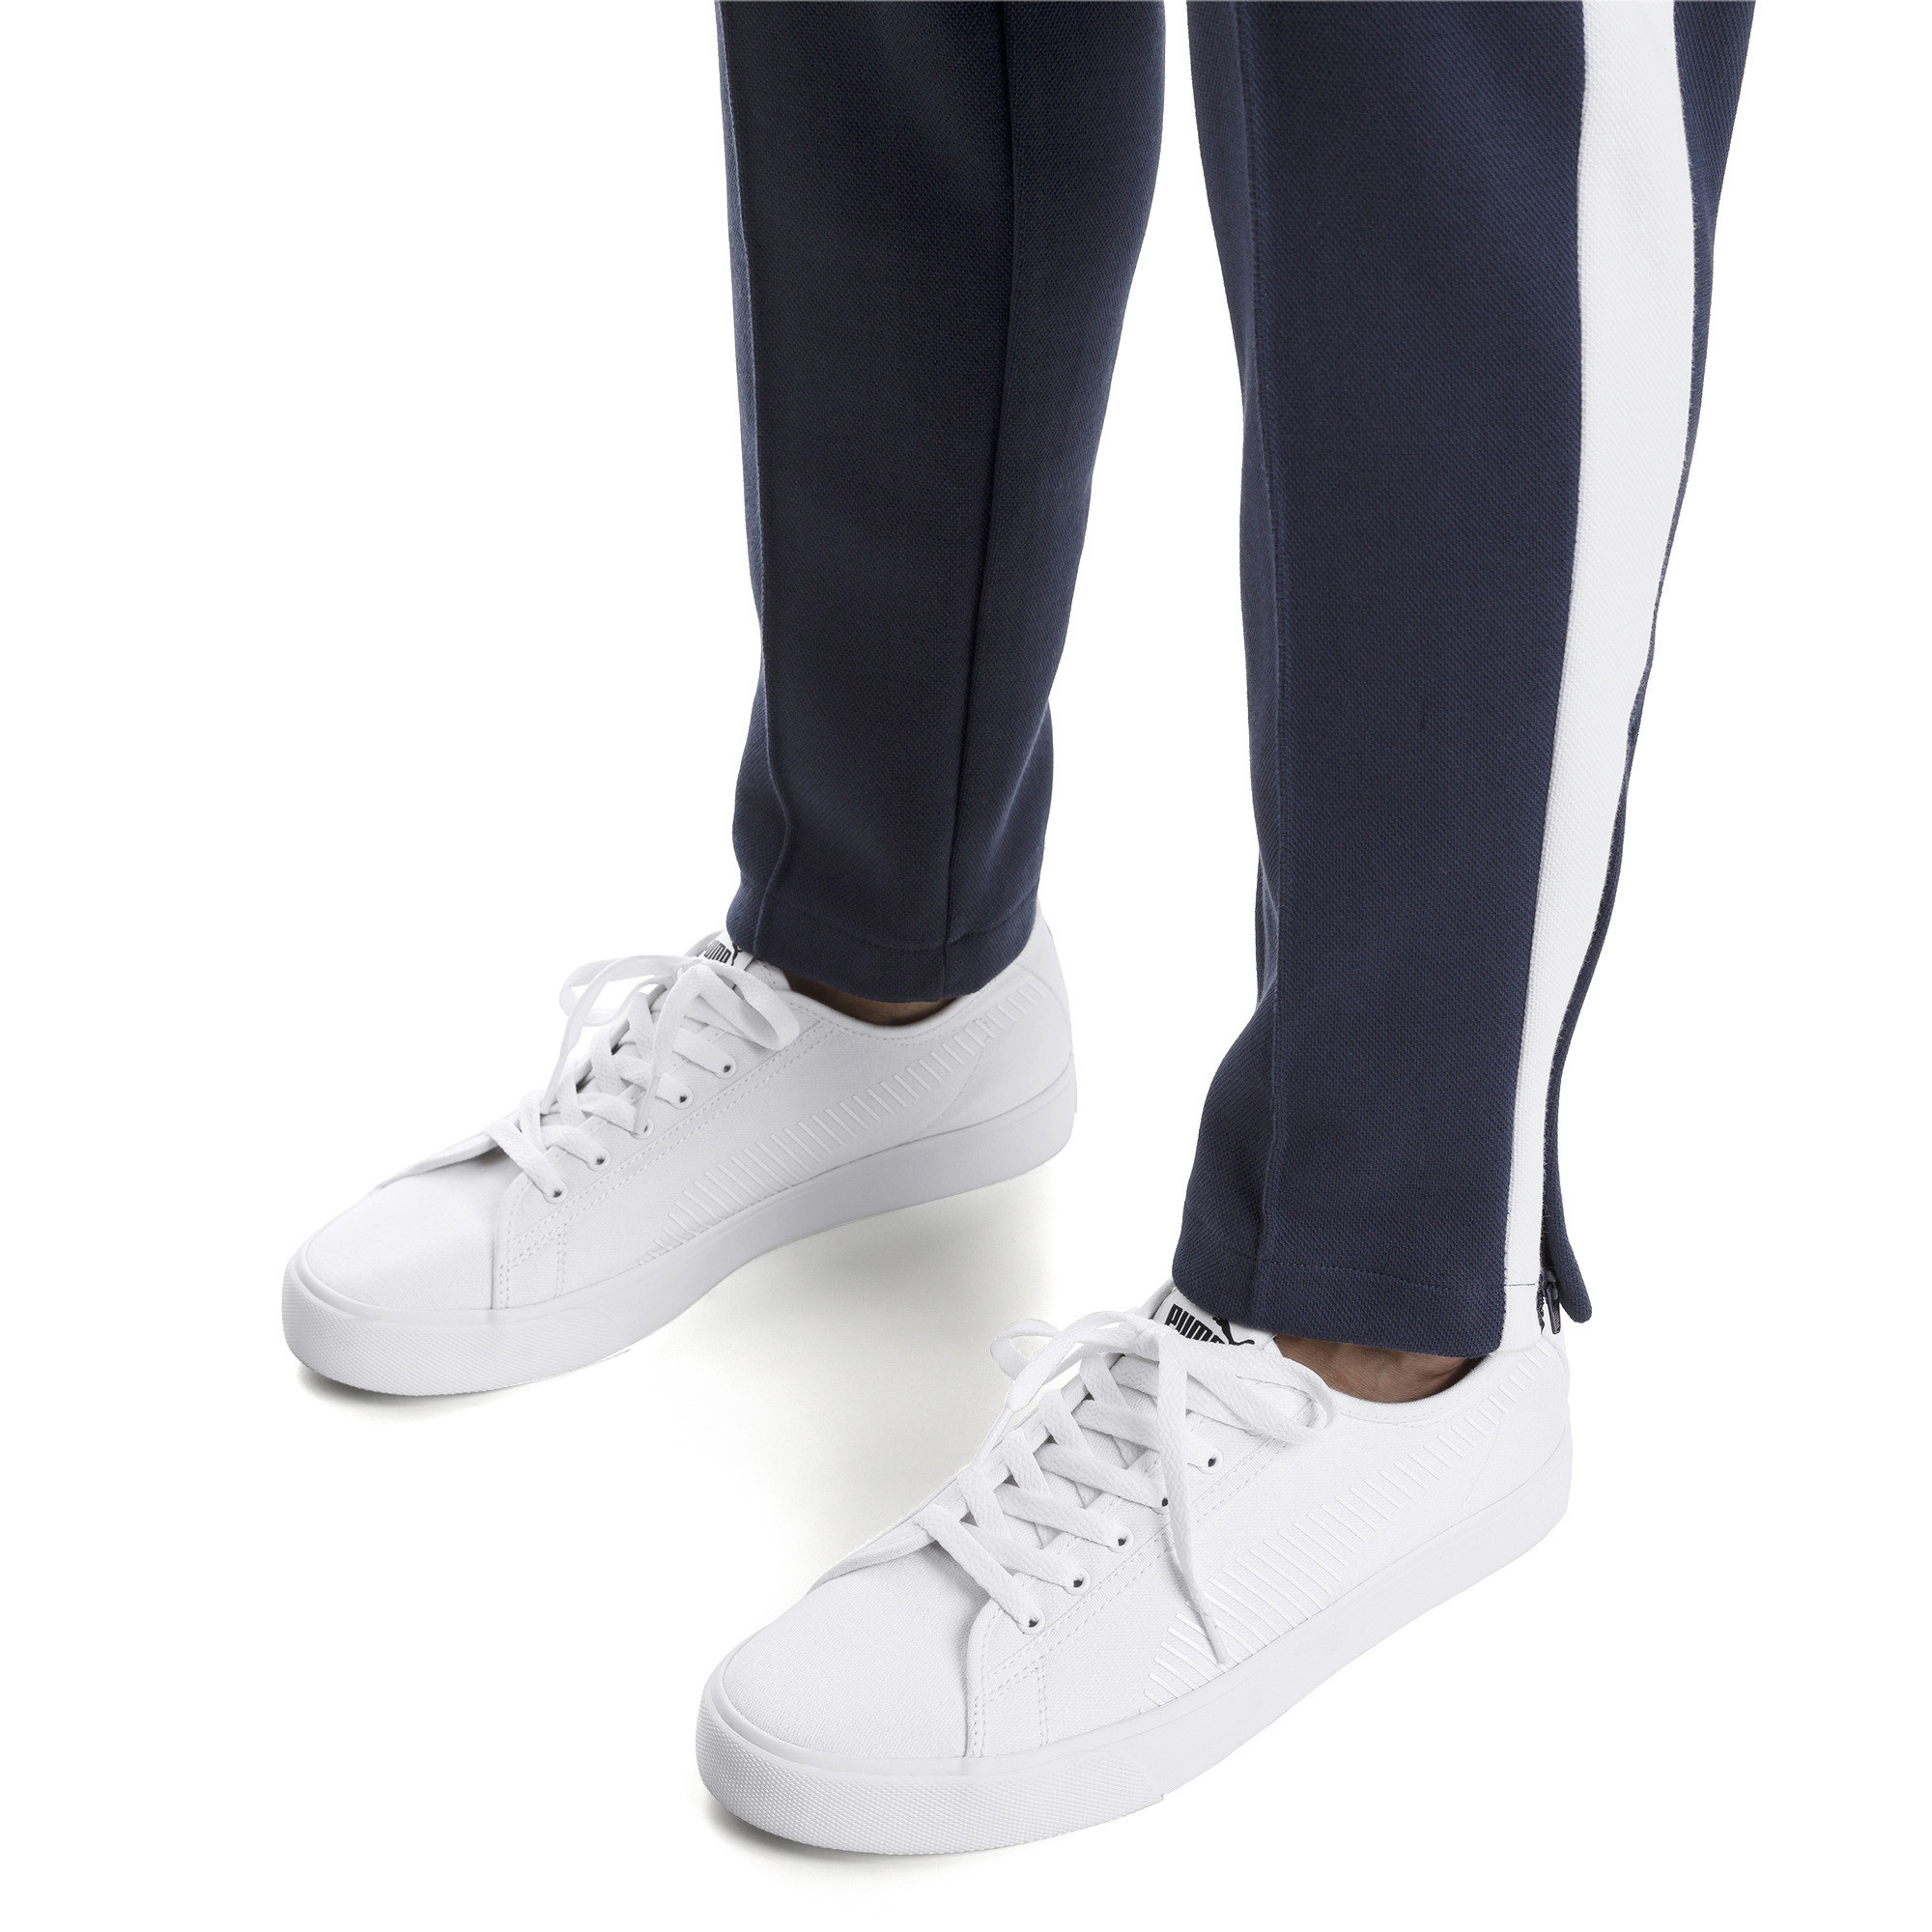 bb5d095b7c Bari Sneakers   20 - White   Puma